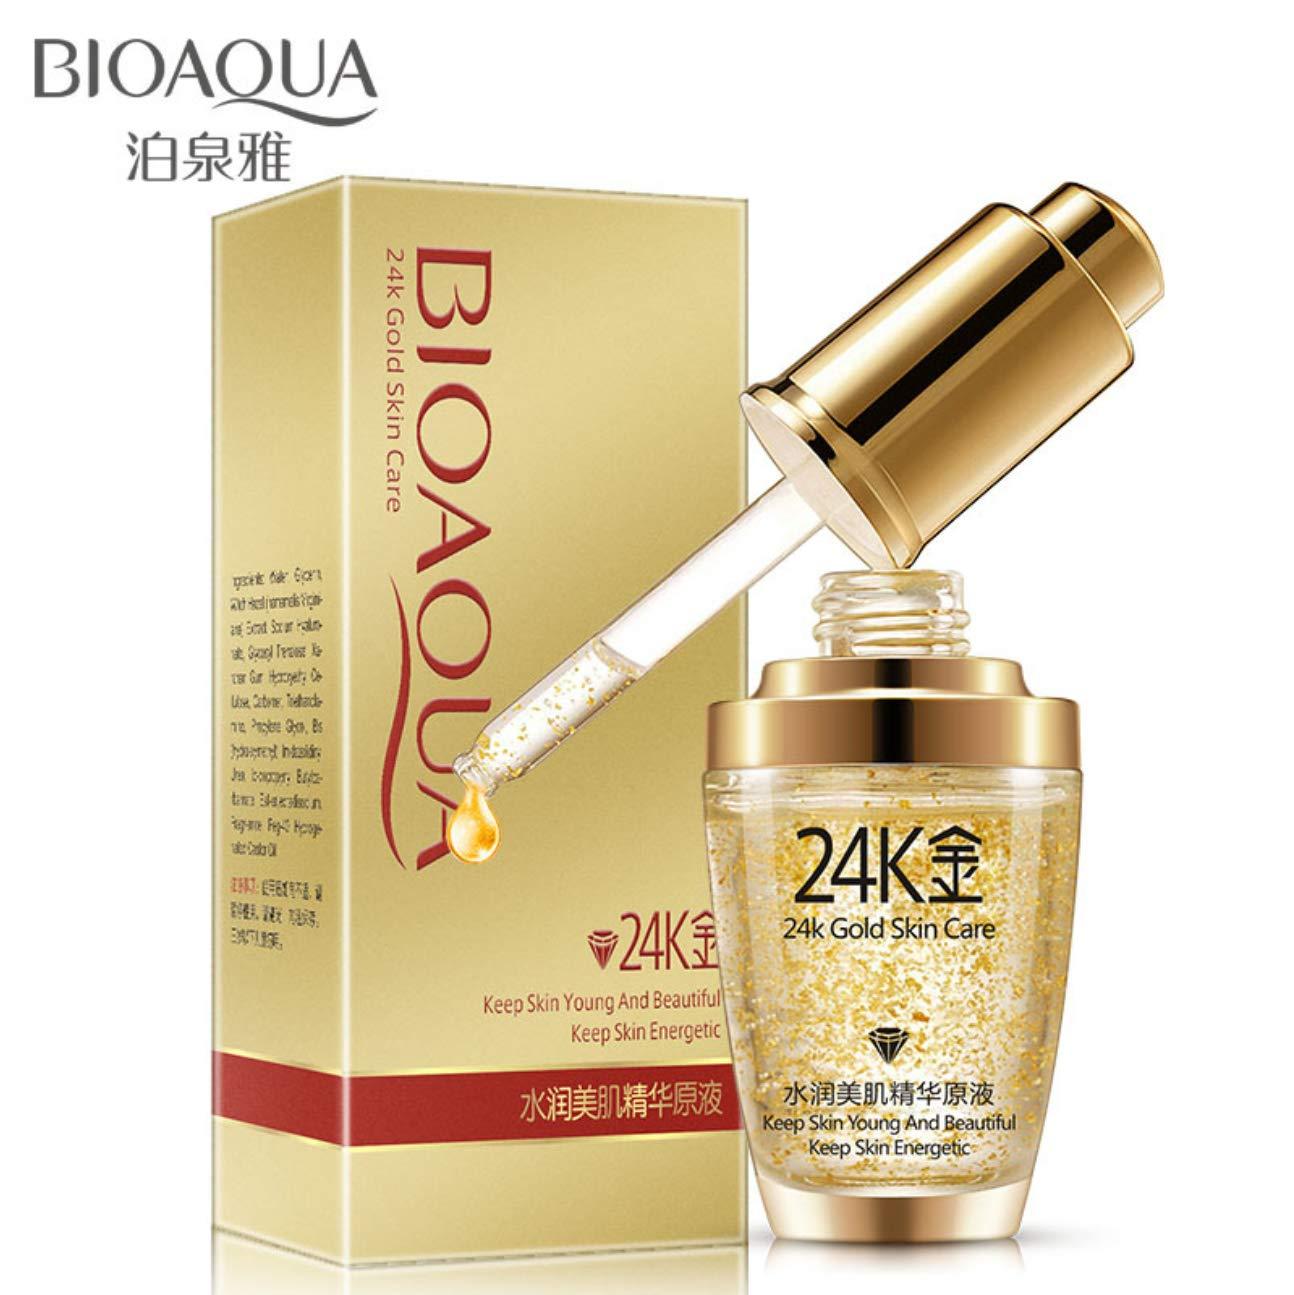 BIOAQUA 24K Gold Essence Collagen Skin Face Moisturizing Hyaluronic Acid Anti-Aging Mask Natural Extract